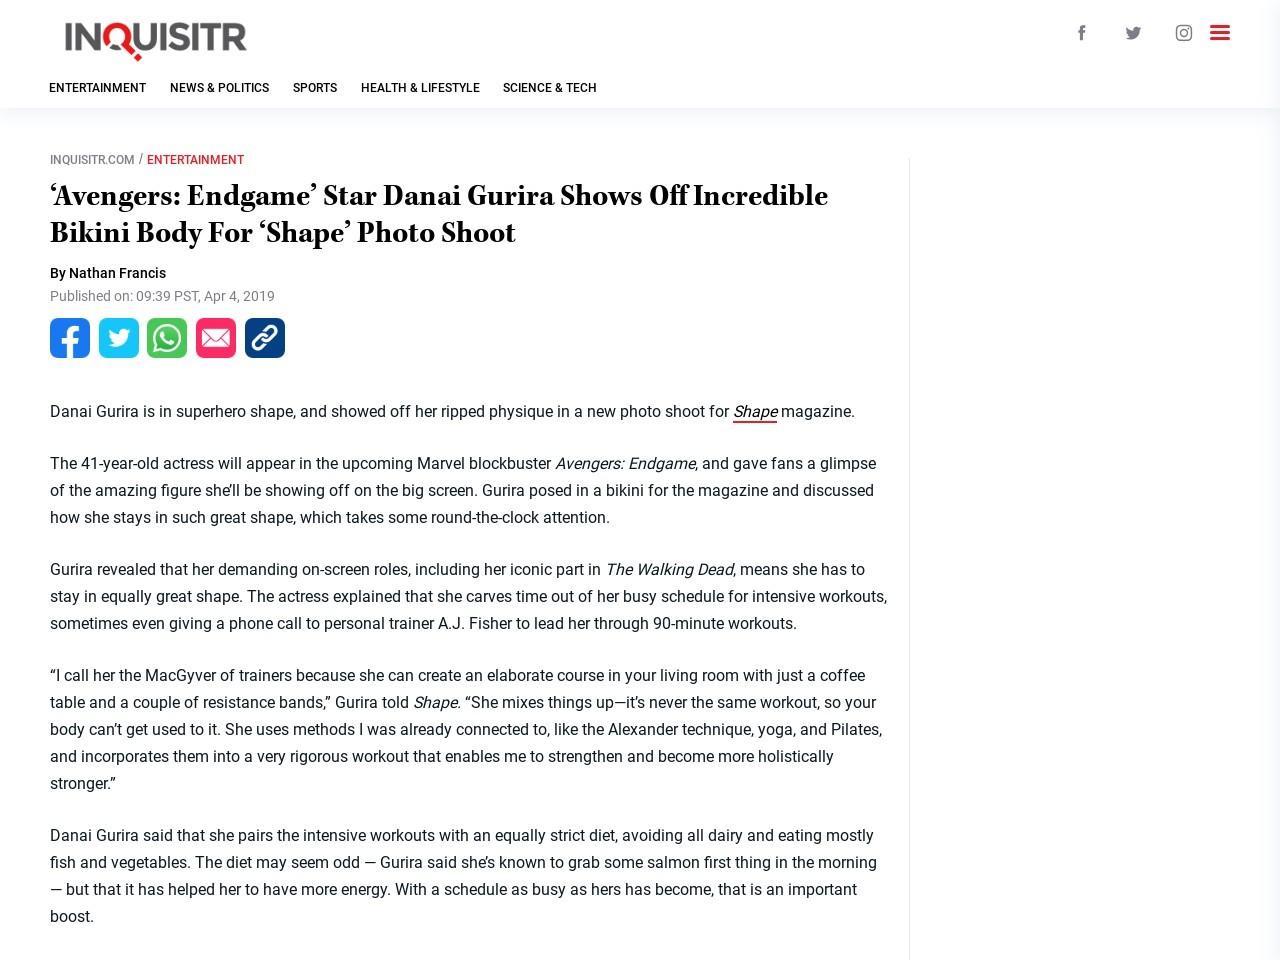 'Avengers: End Game' Star Danai Gurira Shows Off Incredible Bikini…